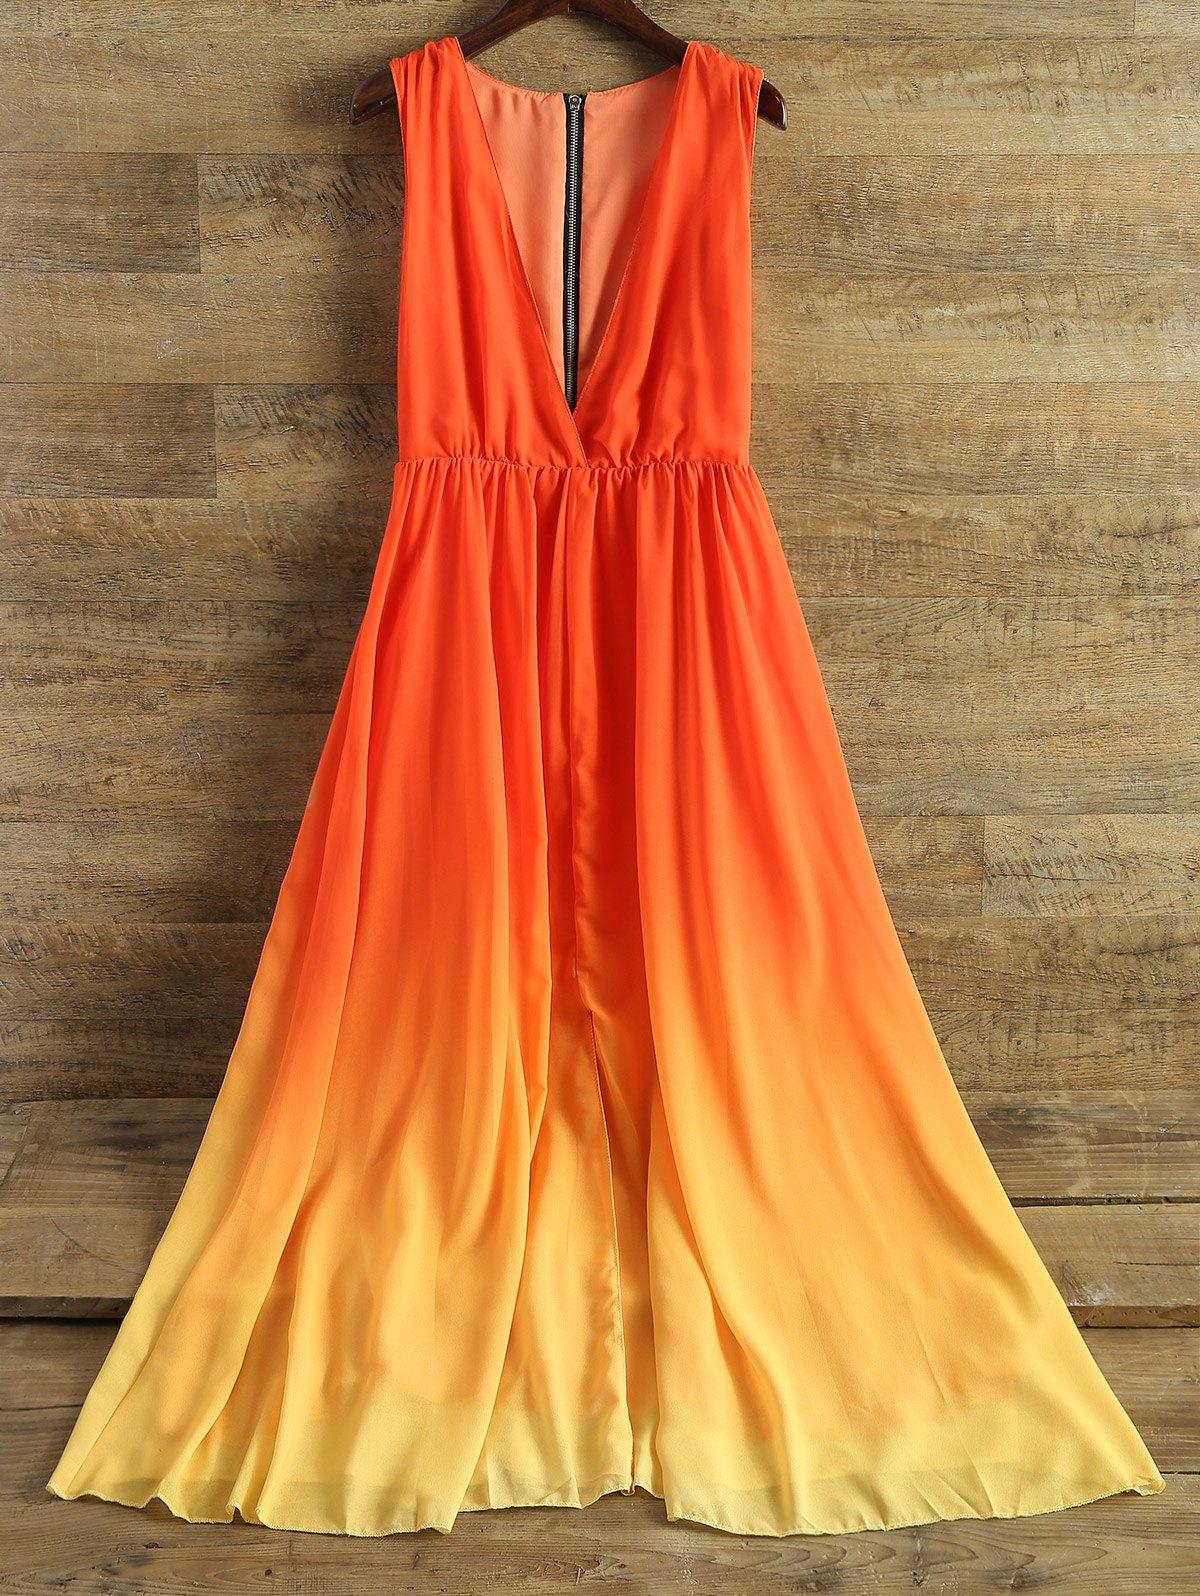 Plunging Neck Sleeveless Ombre Chiffon Dress